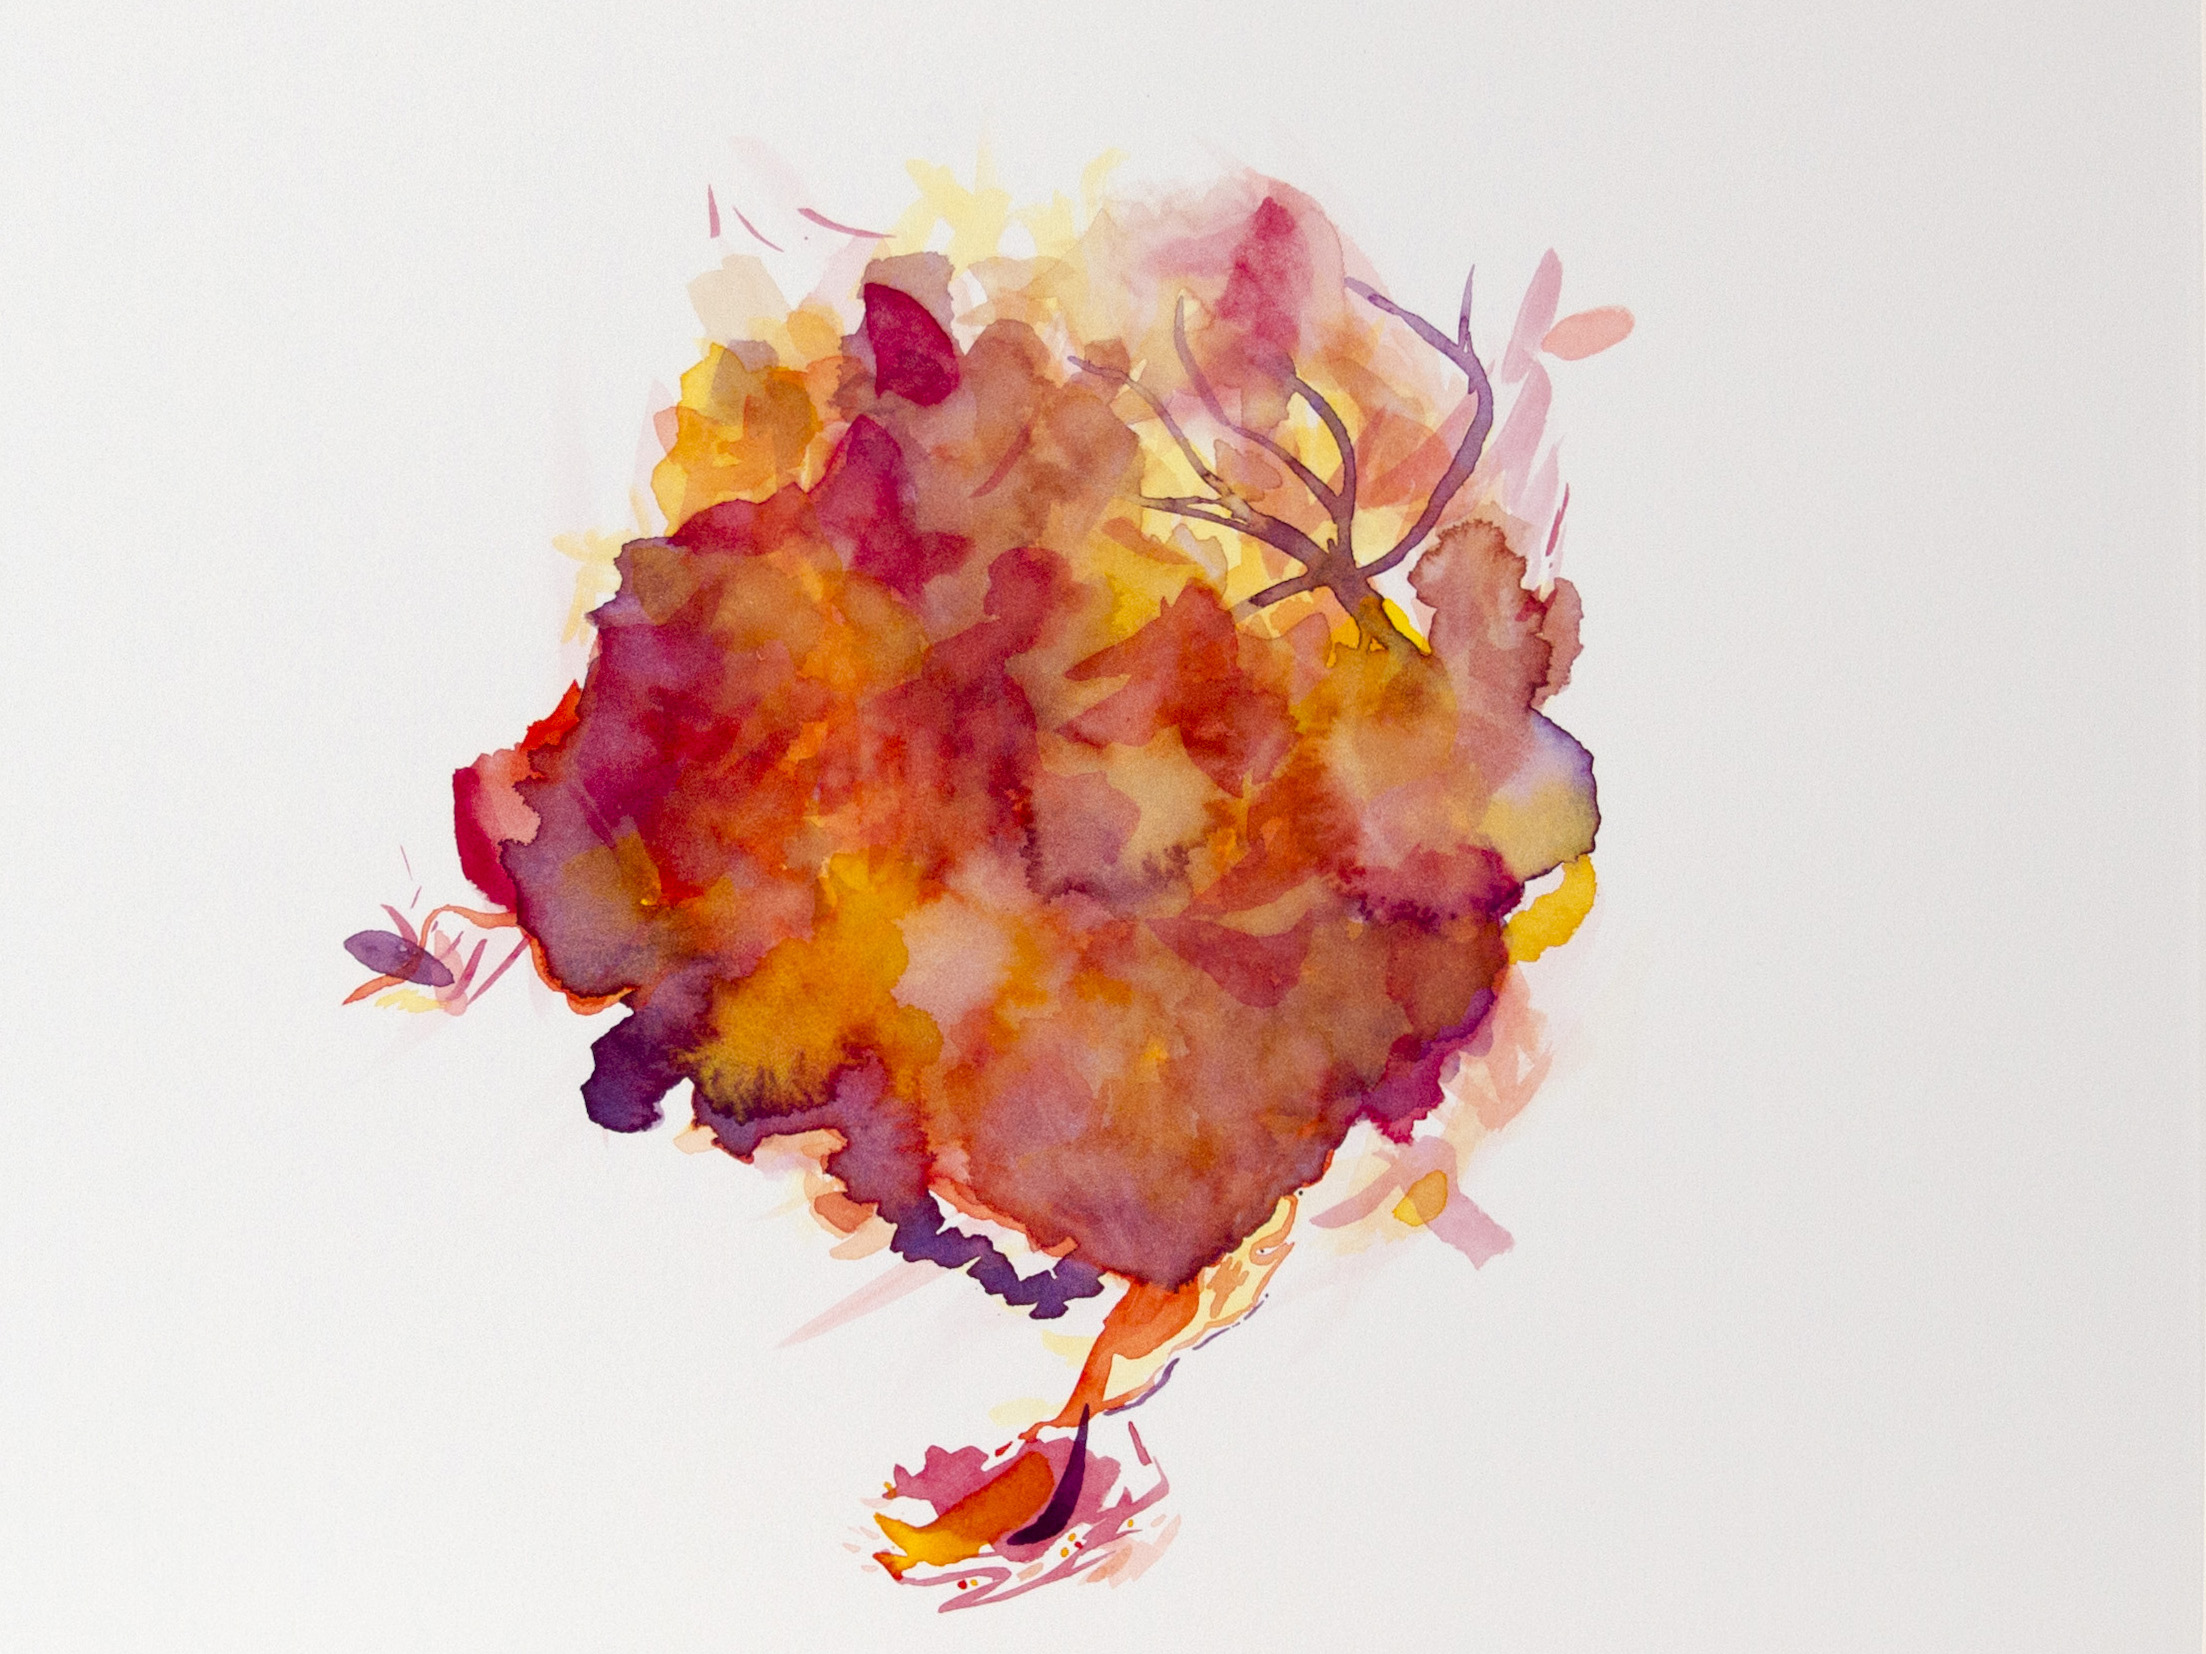 abstractwatercolorheartframedwebsite.jpg